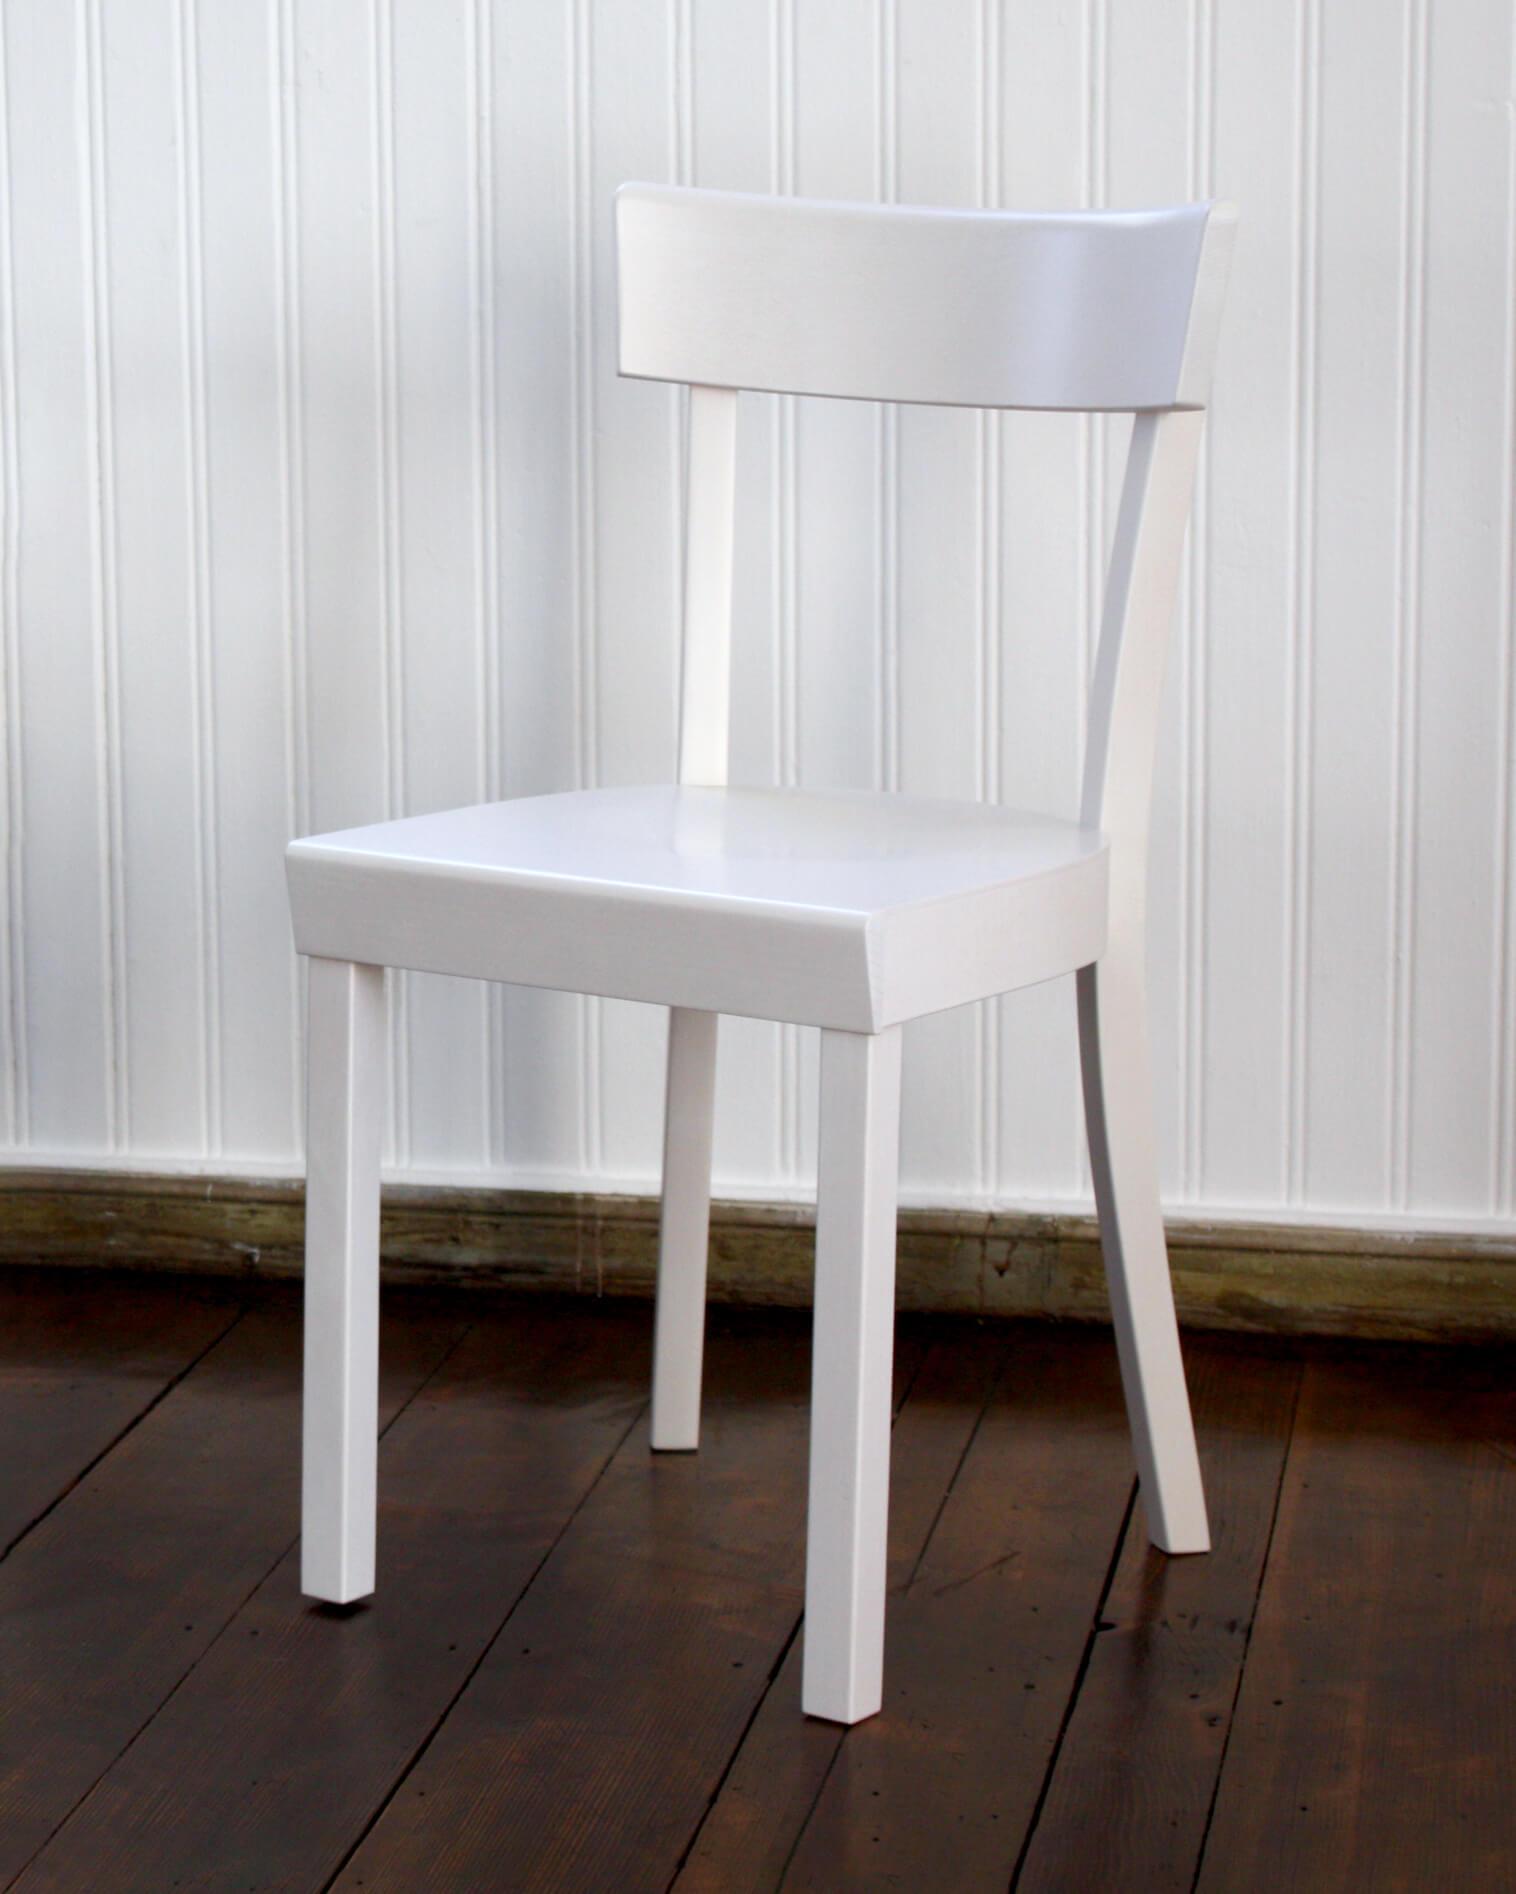 Preise und Spezifikationen des Frankfurter Stuhls - Frankfurter Stuhl